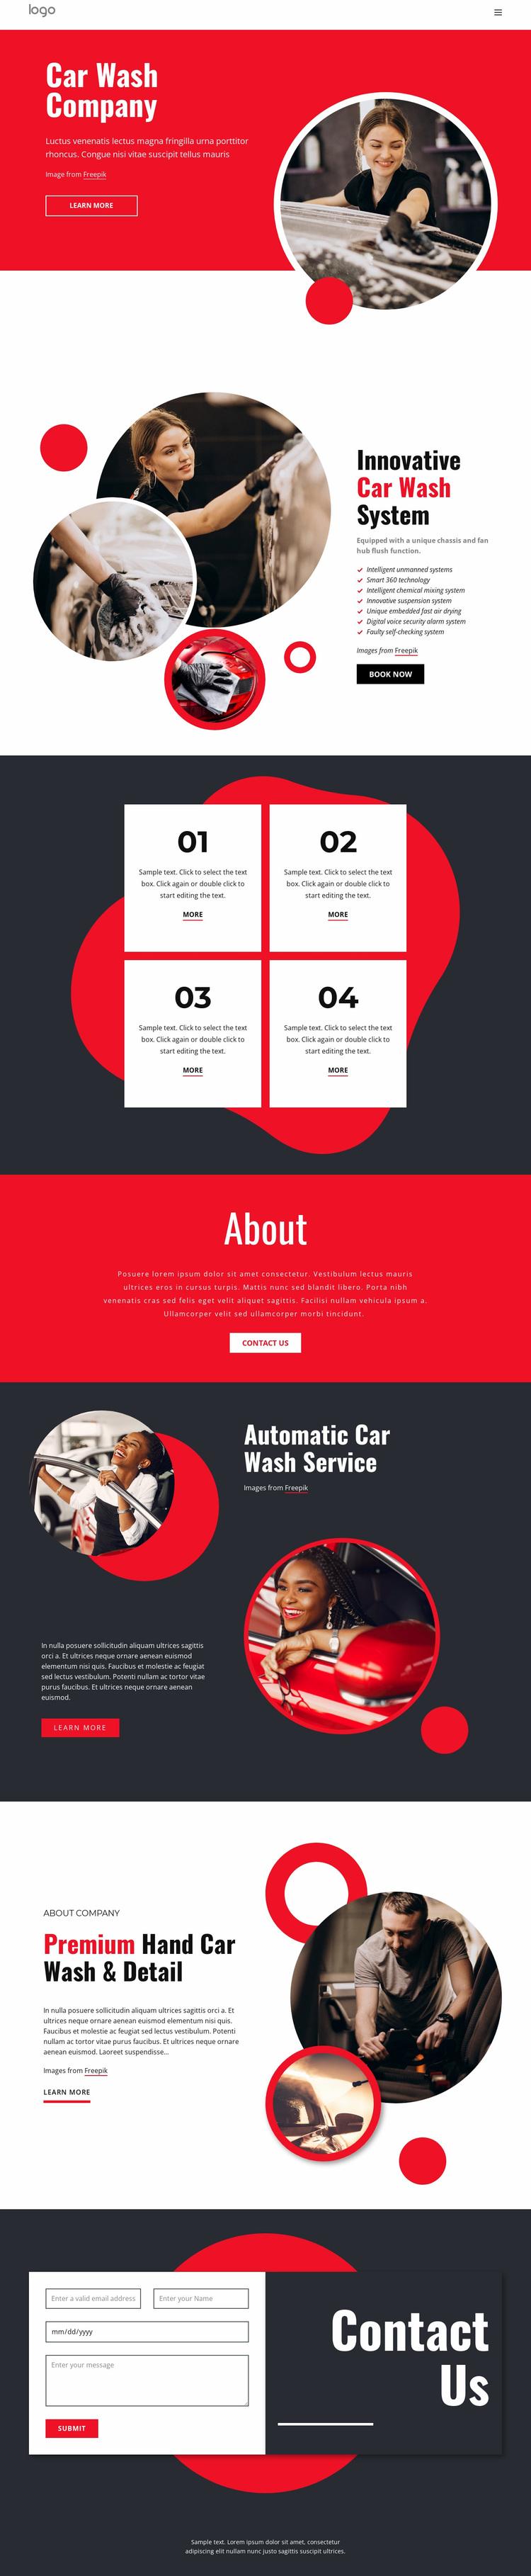 Ecologically friendly car washing Website Design